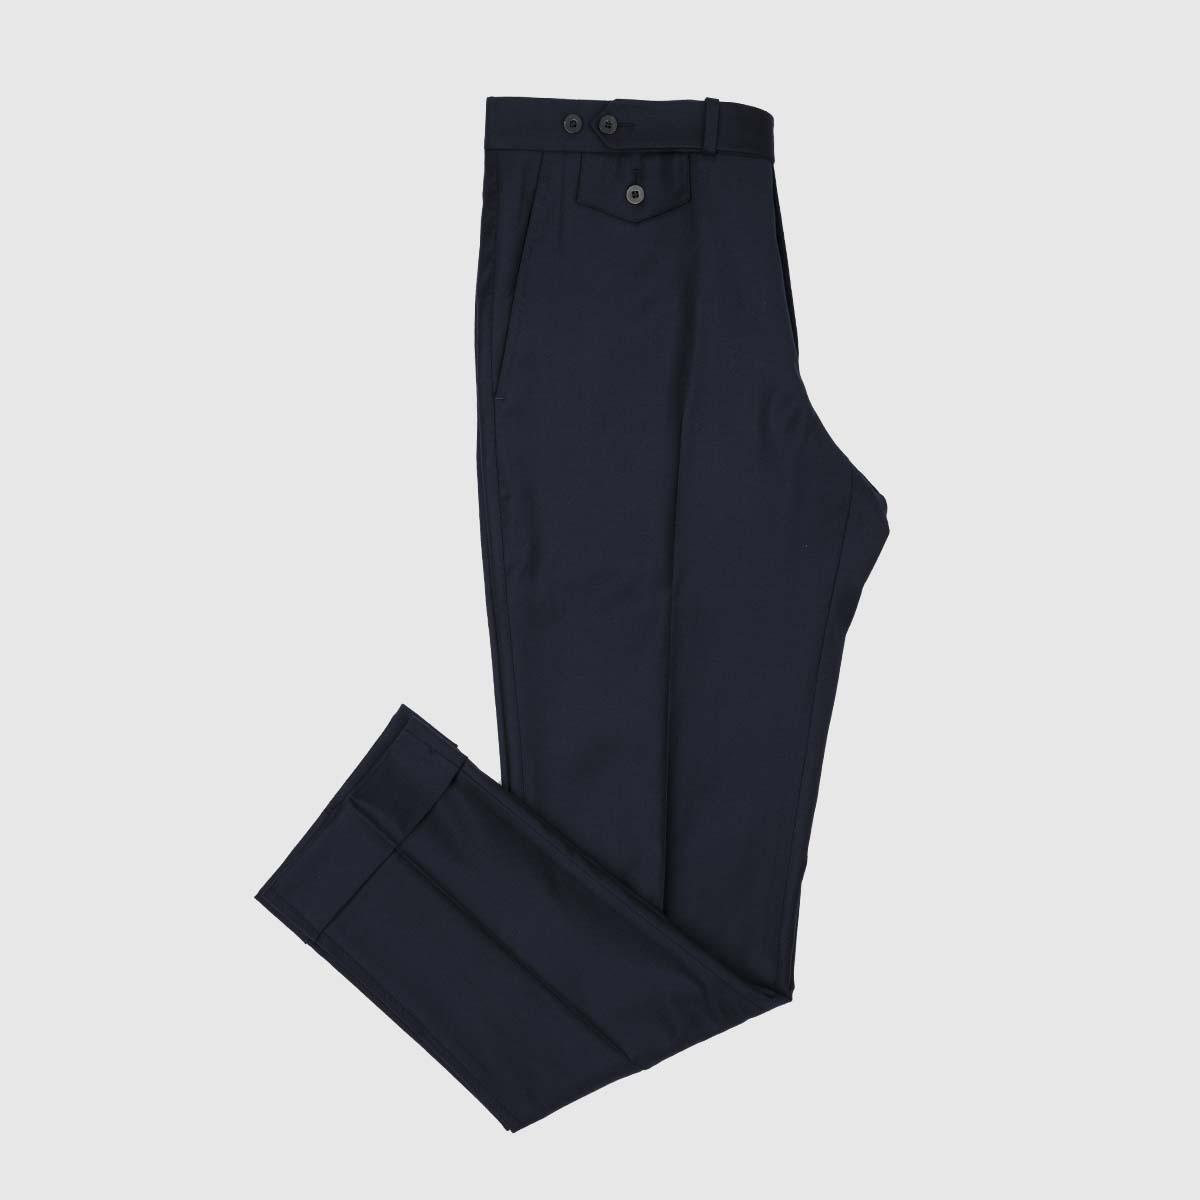 Pantaloni Chino Deep Blu 1 Pinces in Cotone e Lino